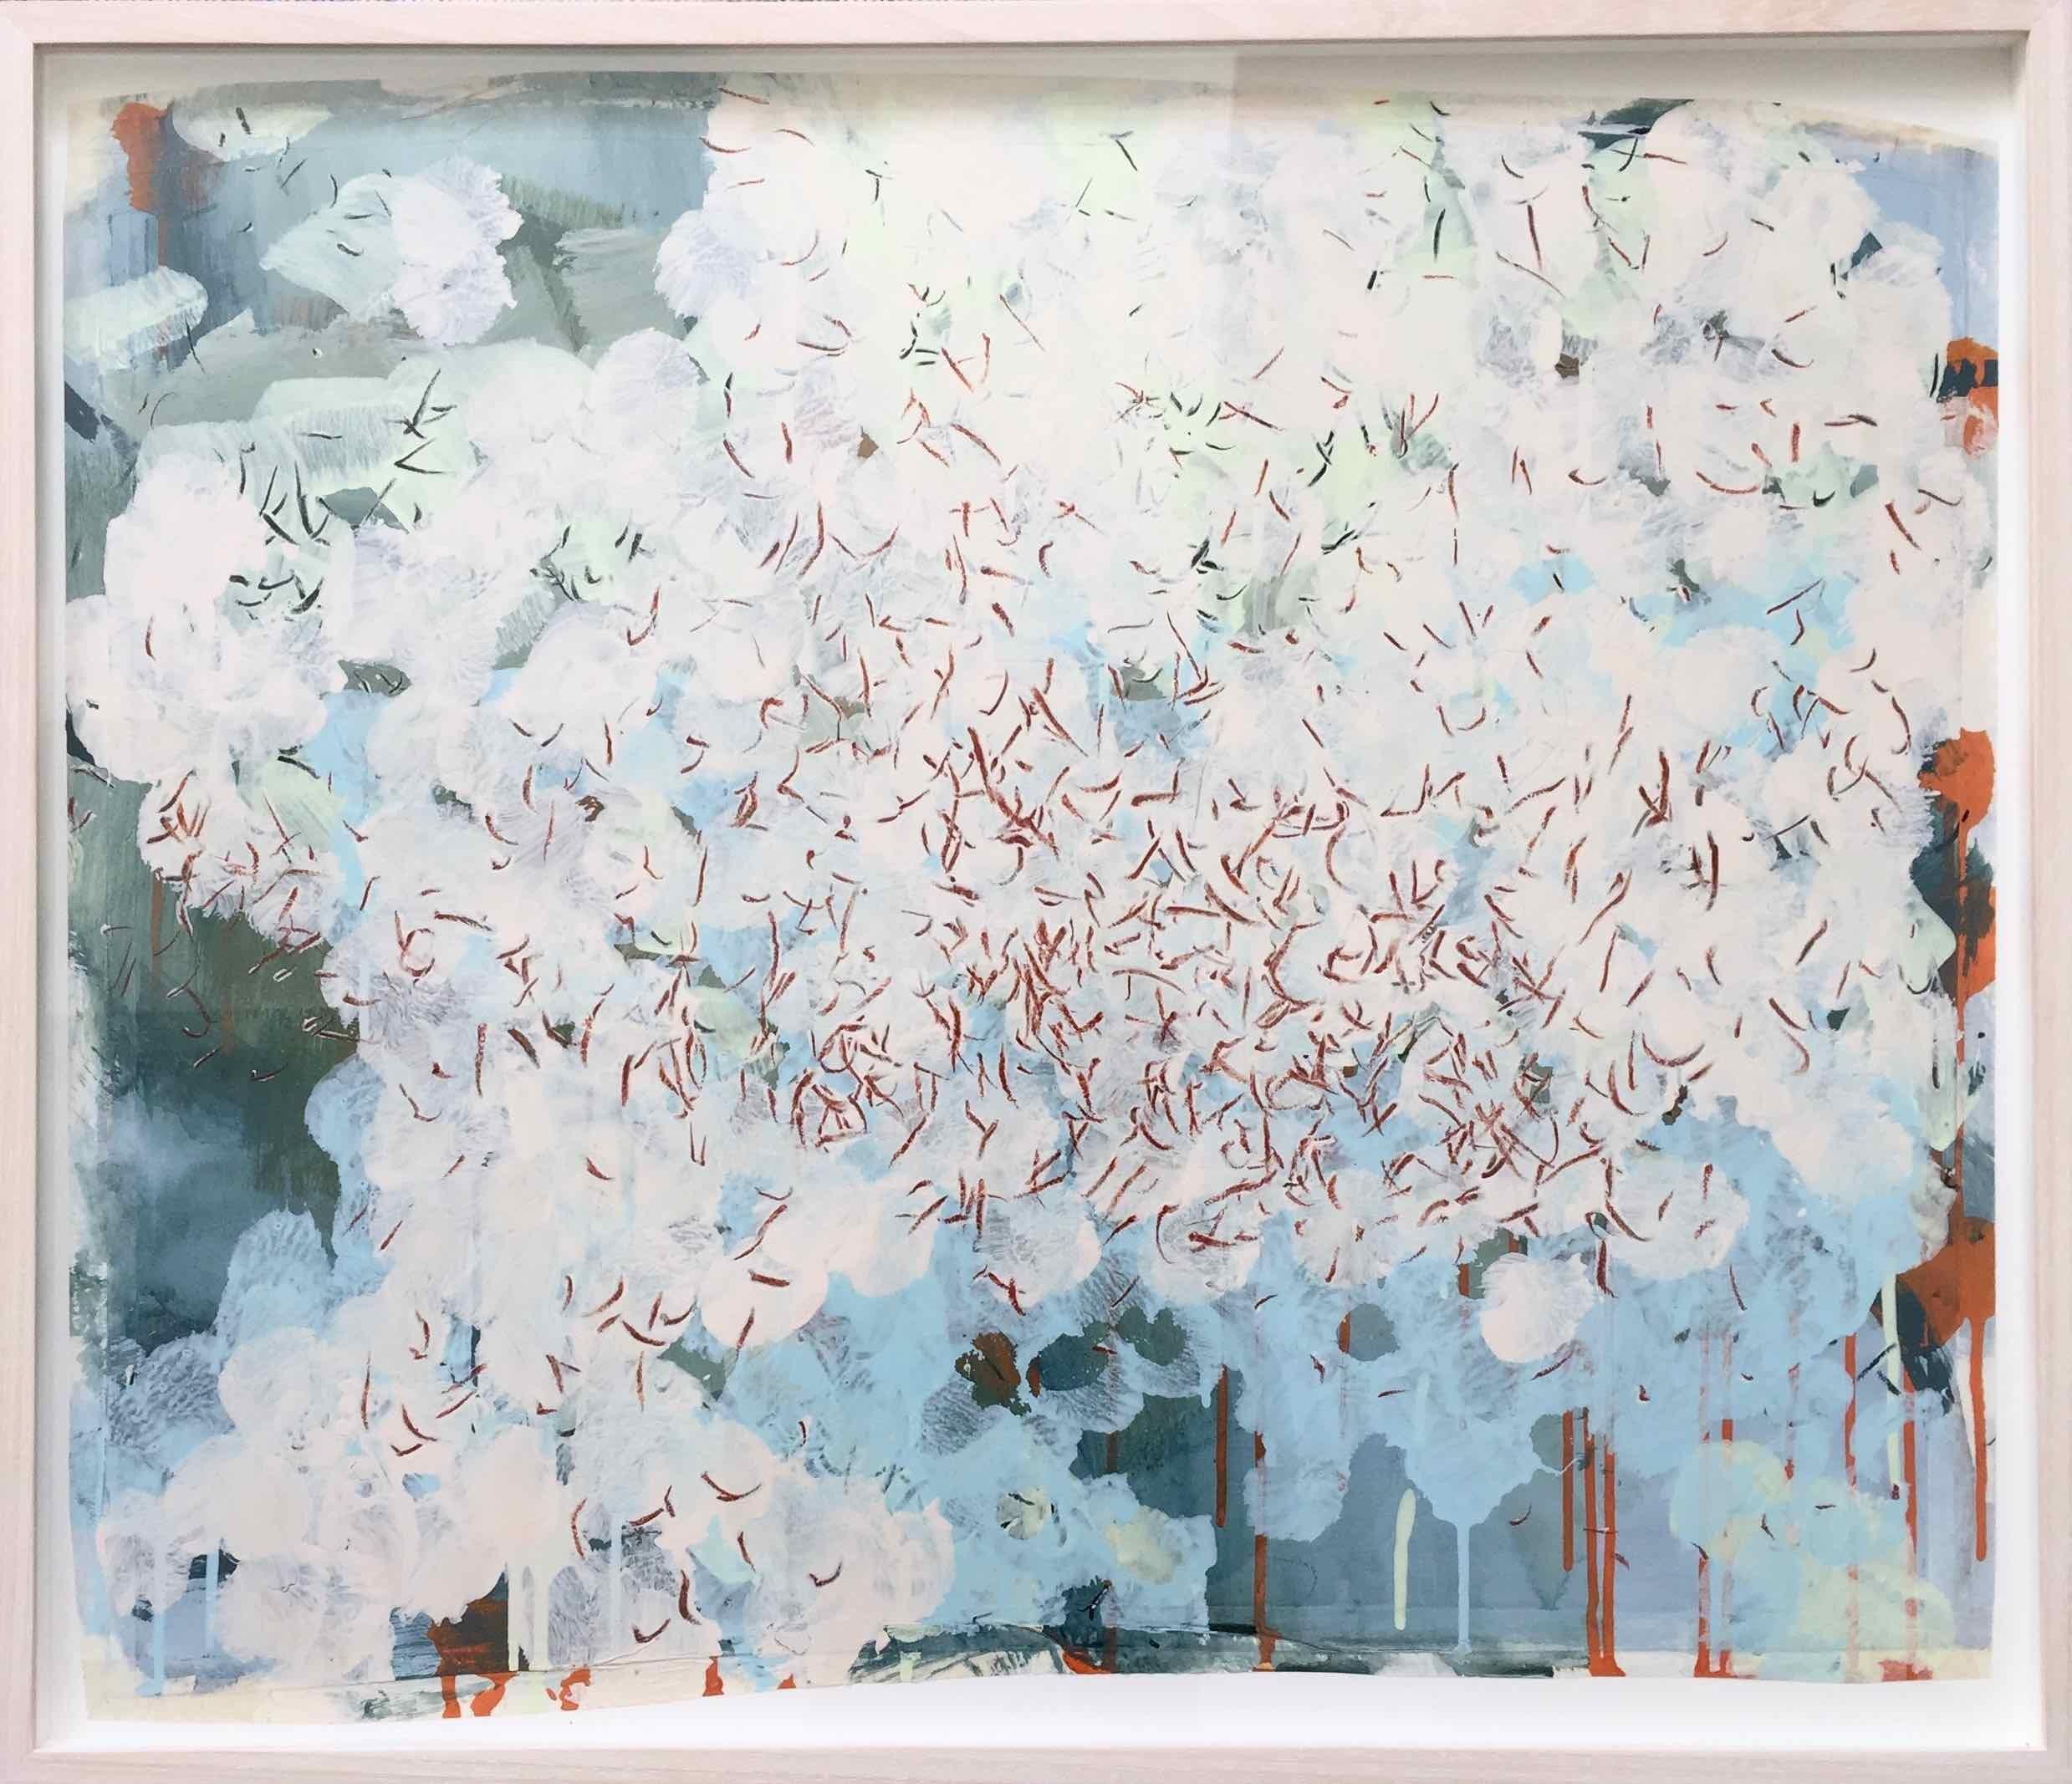 Swarm (Gran Sasso) 3: Painting of White Butterflies in flight by Sara Dudman RWA